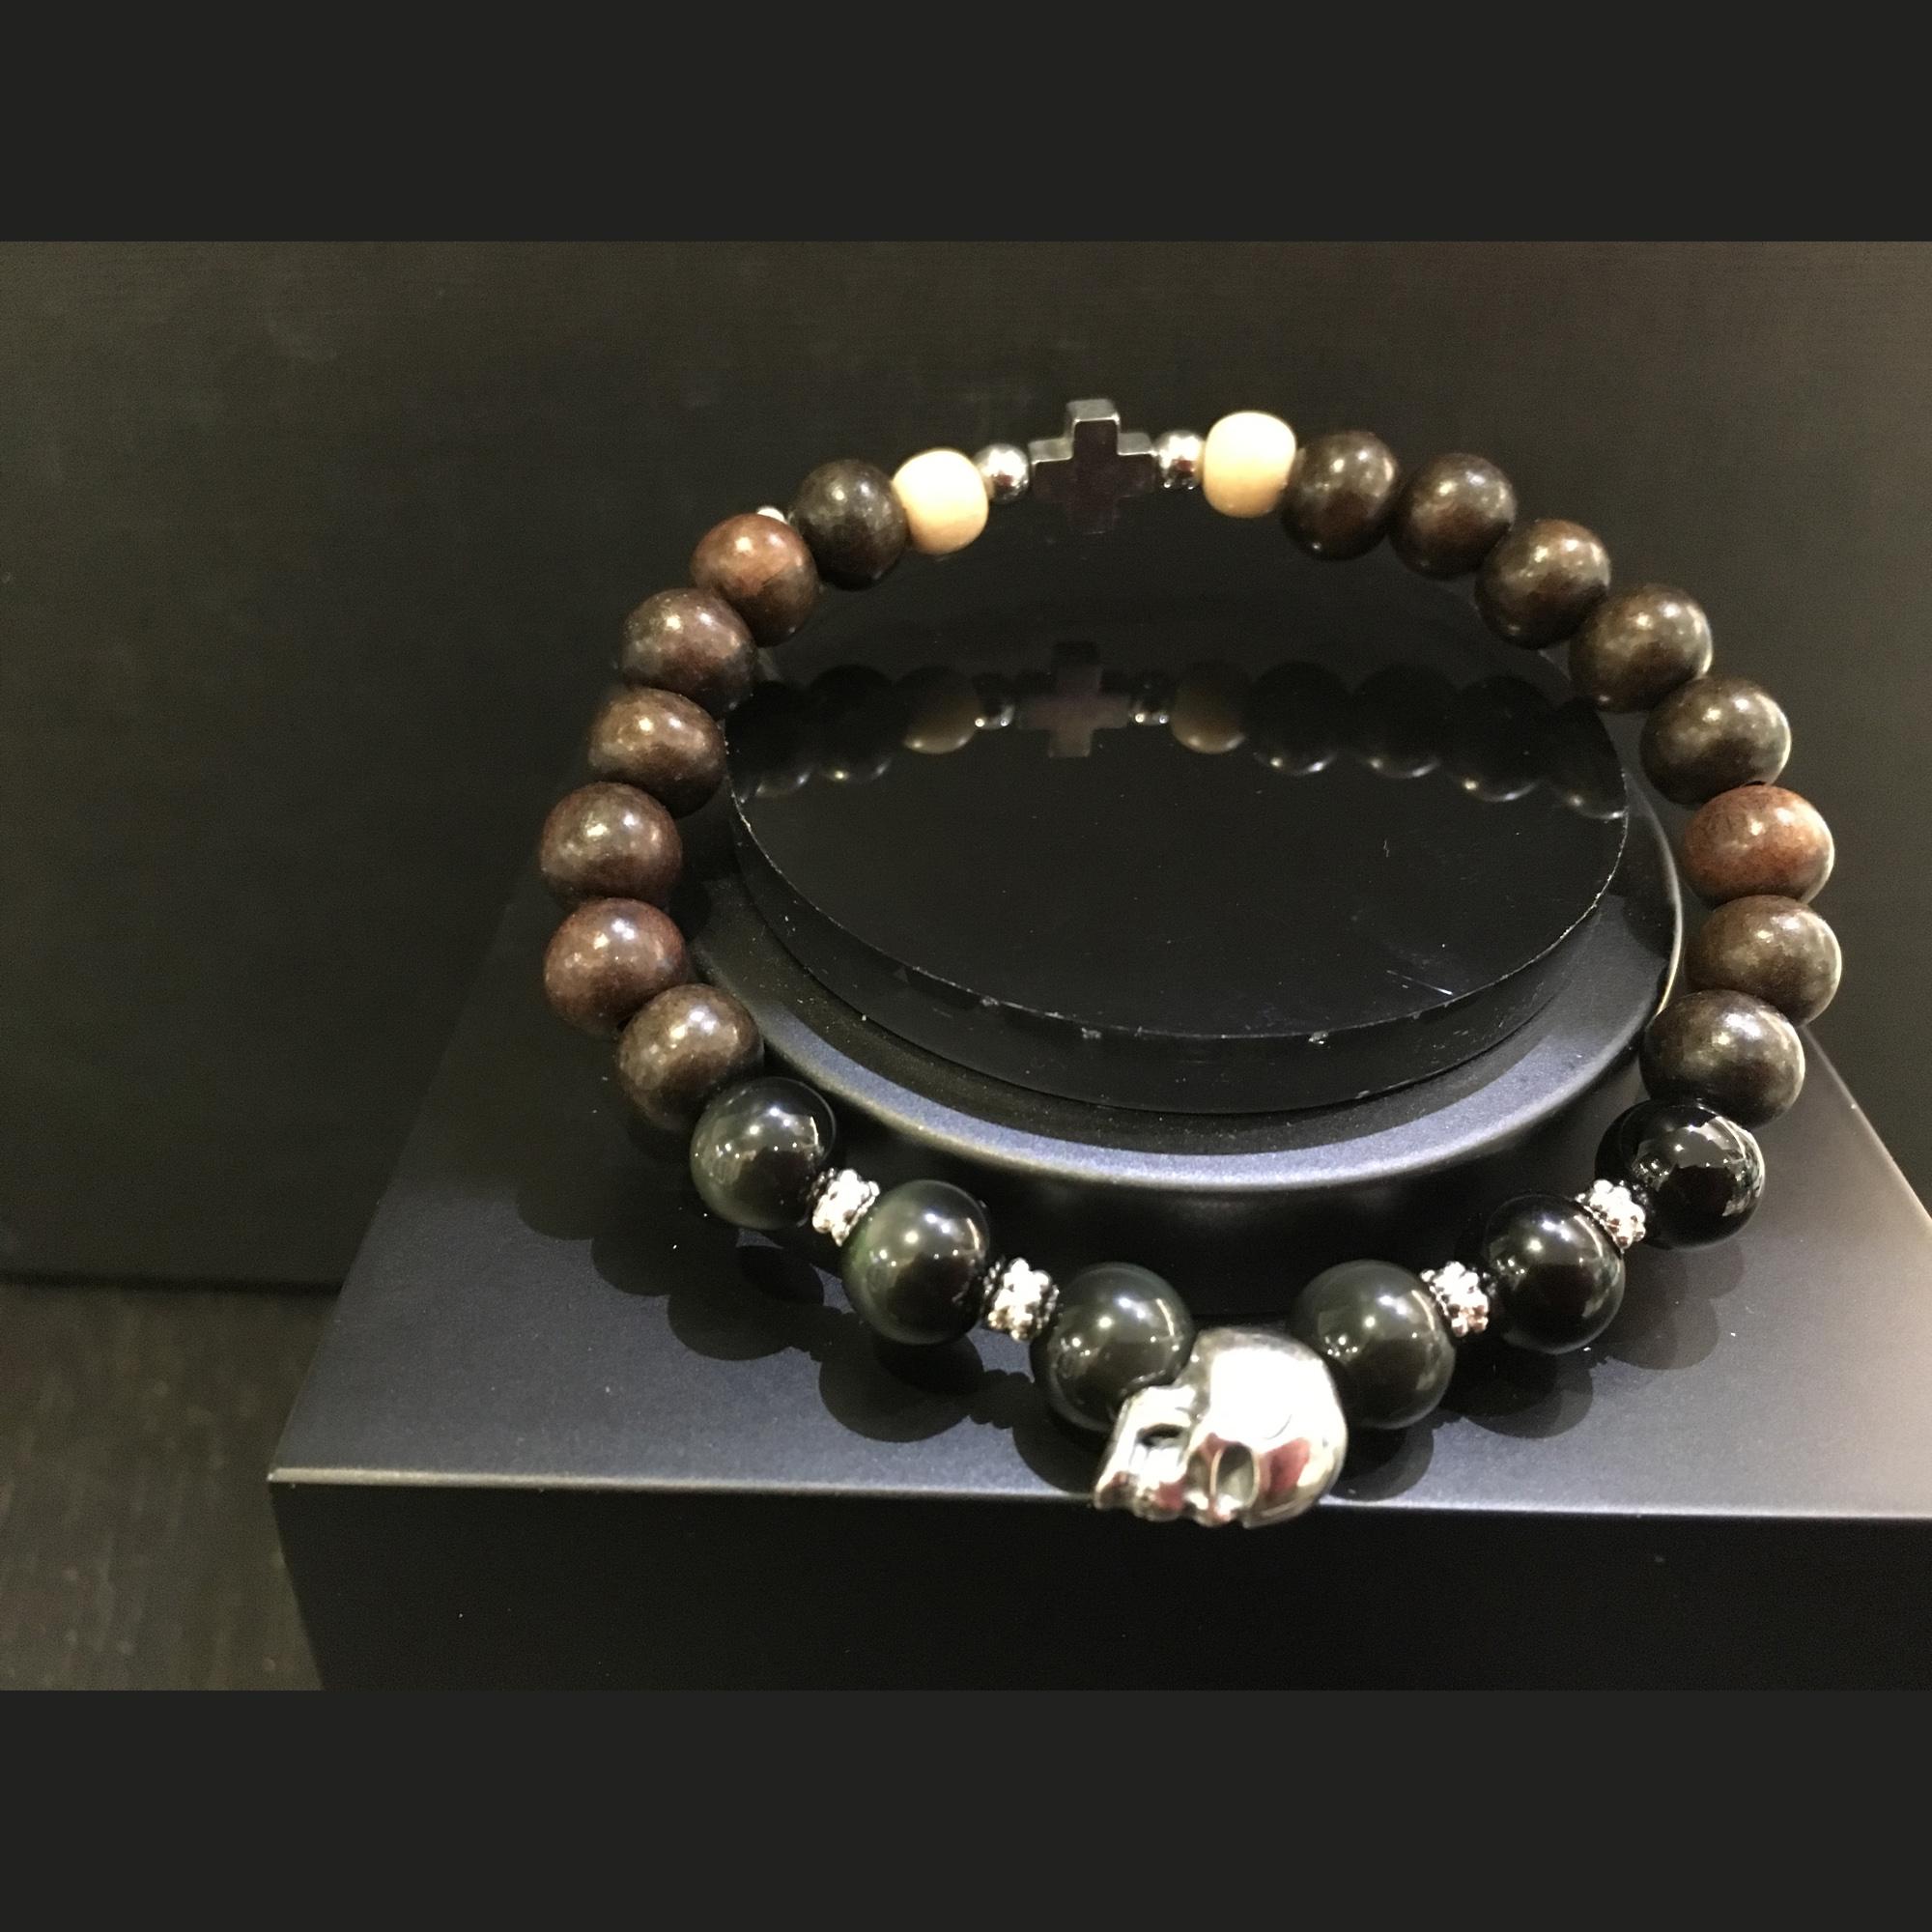 Bracelet17